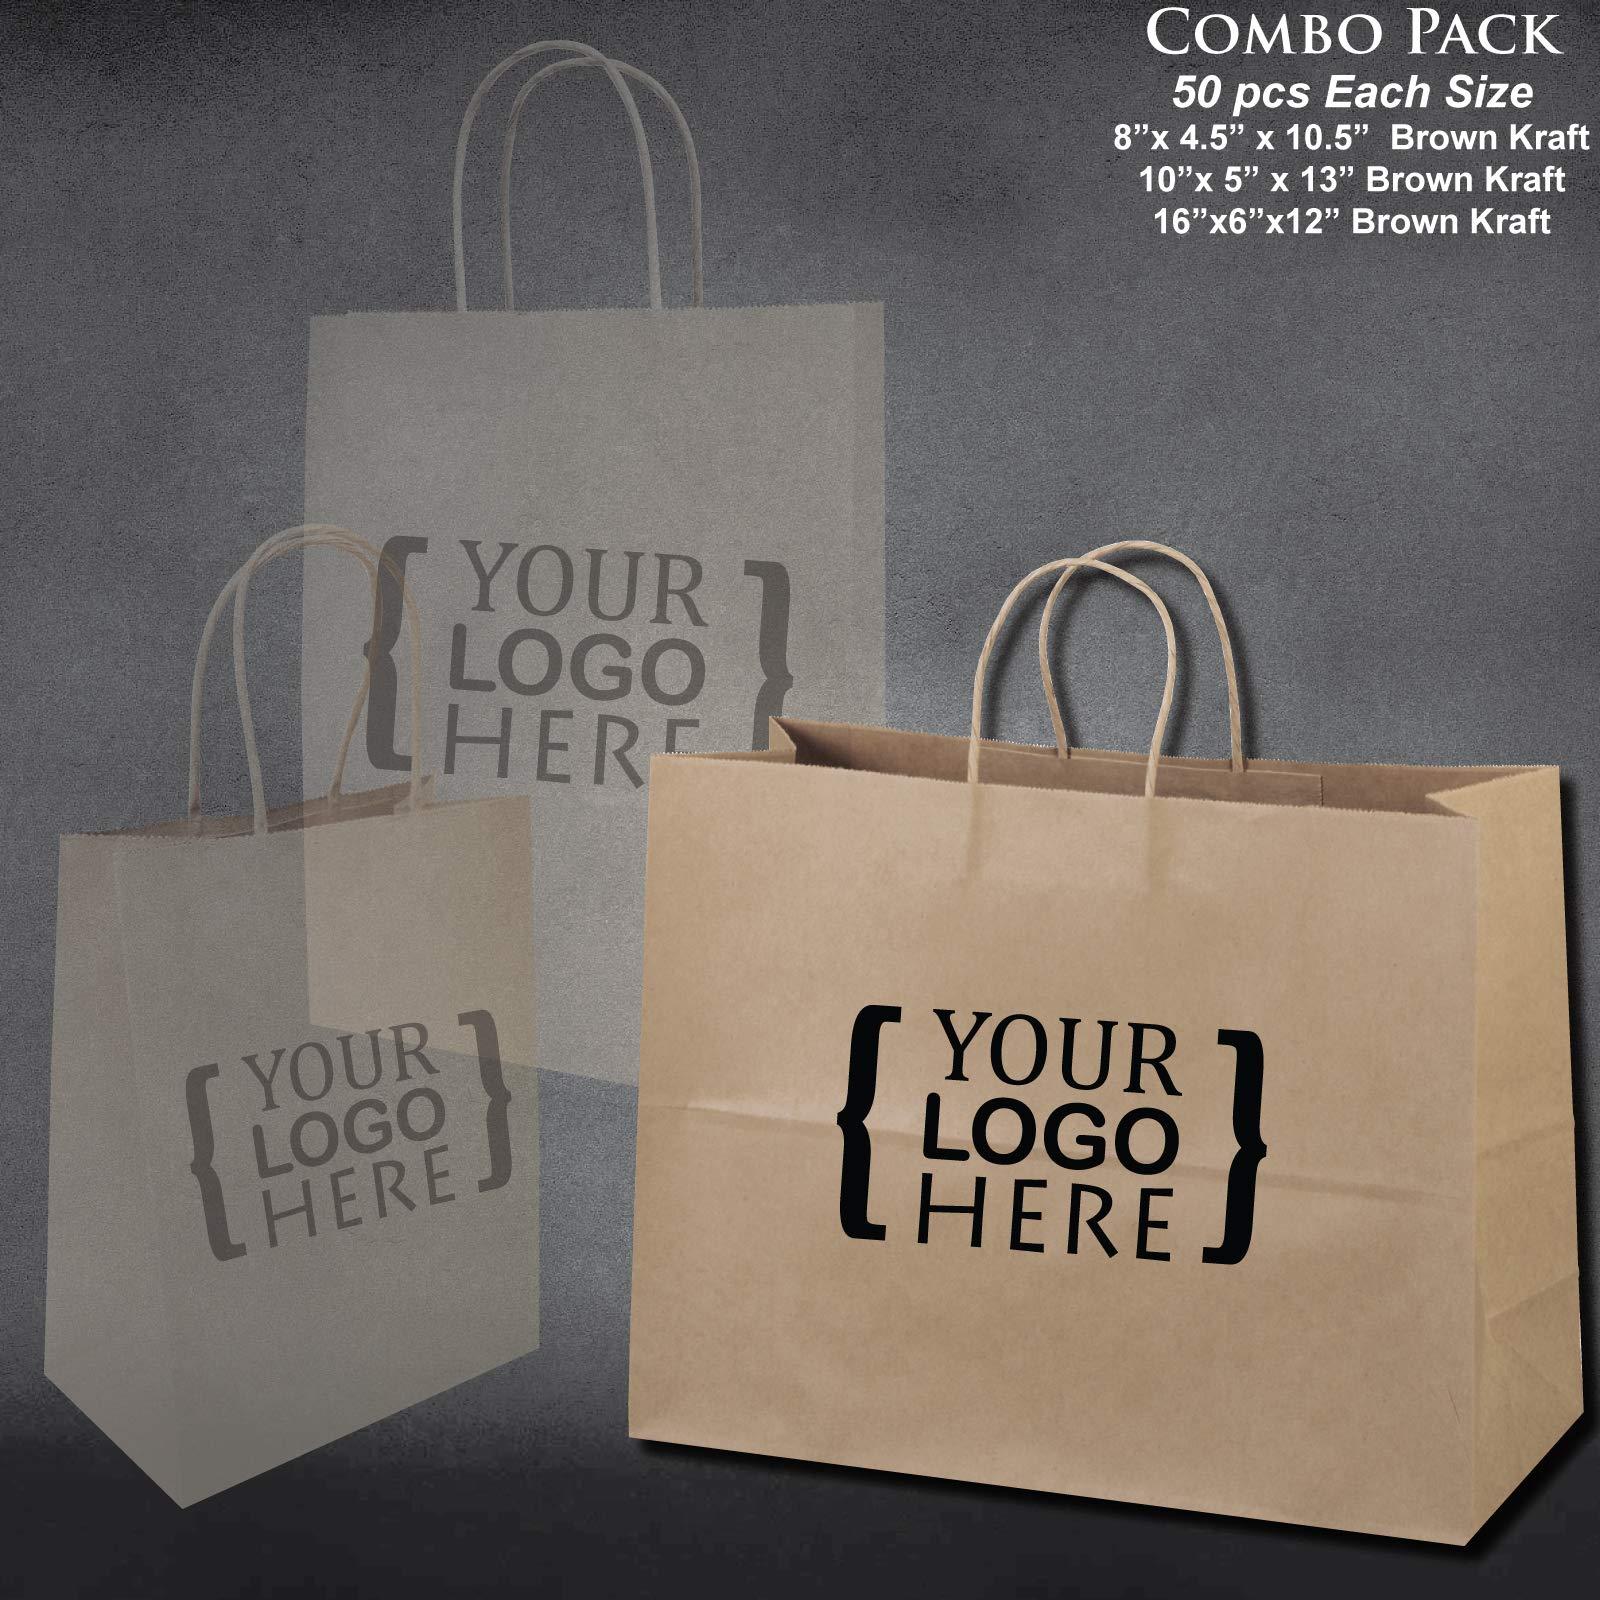 8''x4.75''x10''-10''x5''x13''-16''x6''x12'' - 50 Pcs Each - Custom Printed Bagsource Brown Kraft Paper Bags 95% Post Consumer Materials & FSC Certified … (Custom Printed) by Bag Source (Image #4)